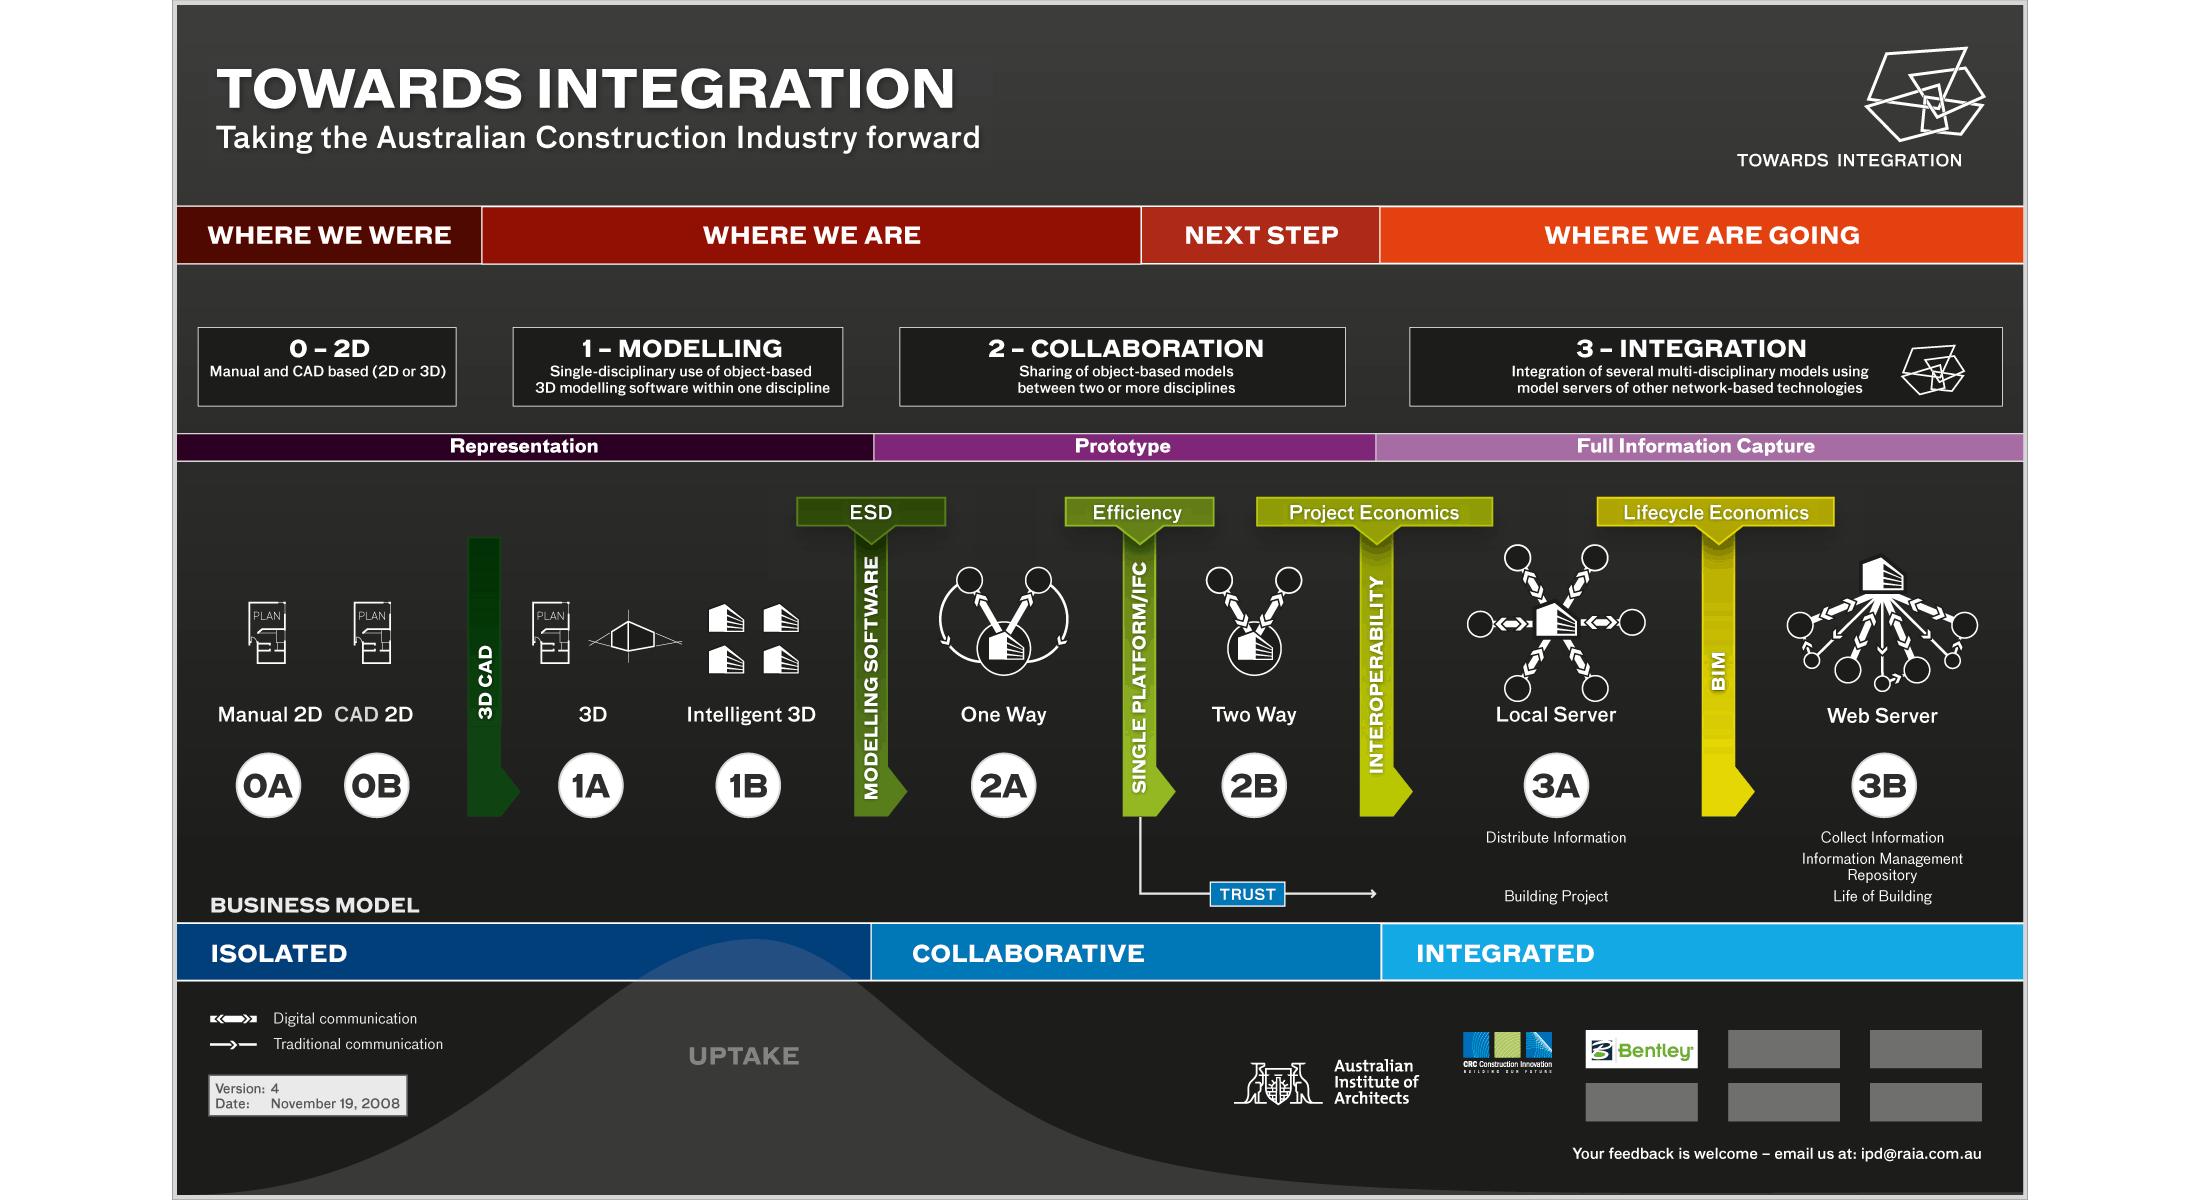 Towards Integration Diagram